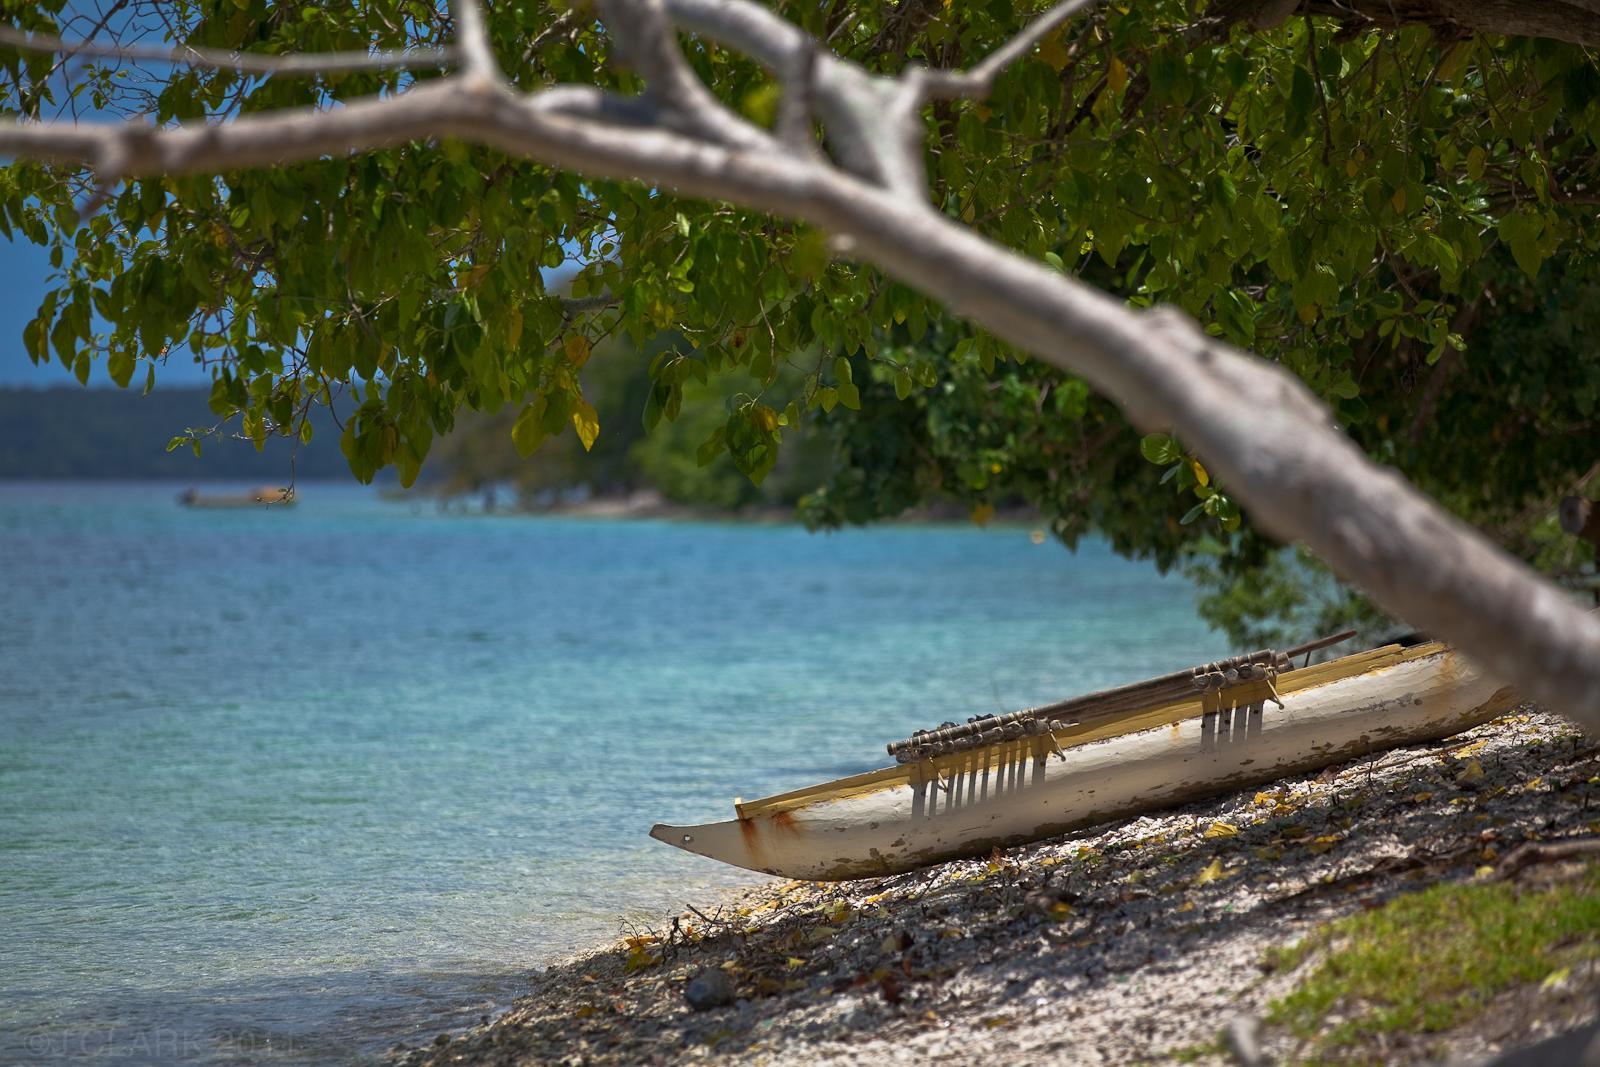 IDEALIC BEACH ON EFATE, VANUATU